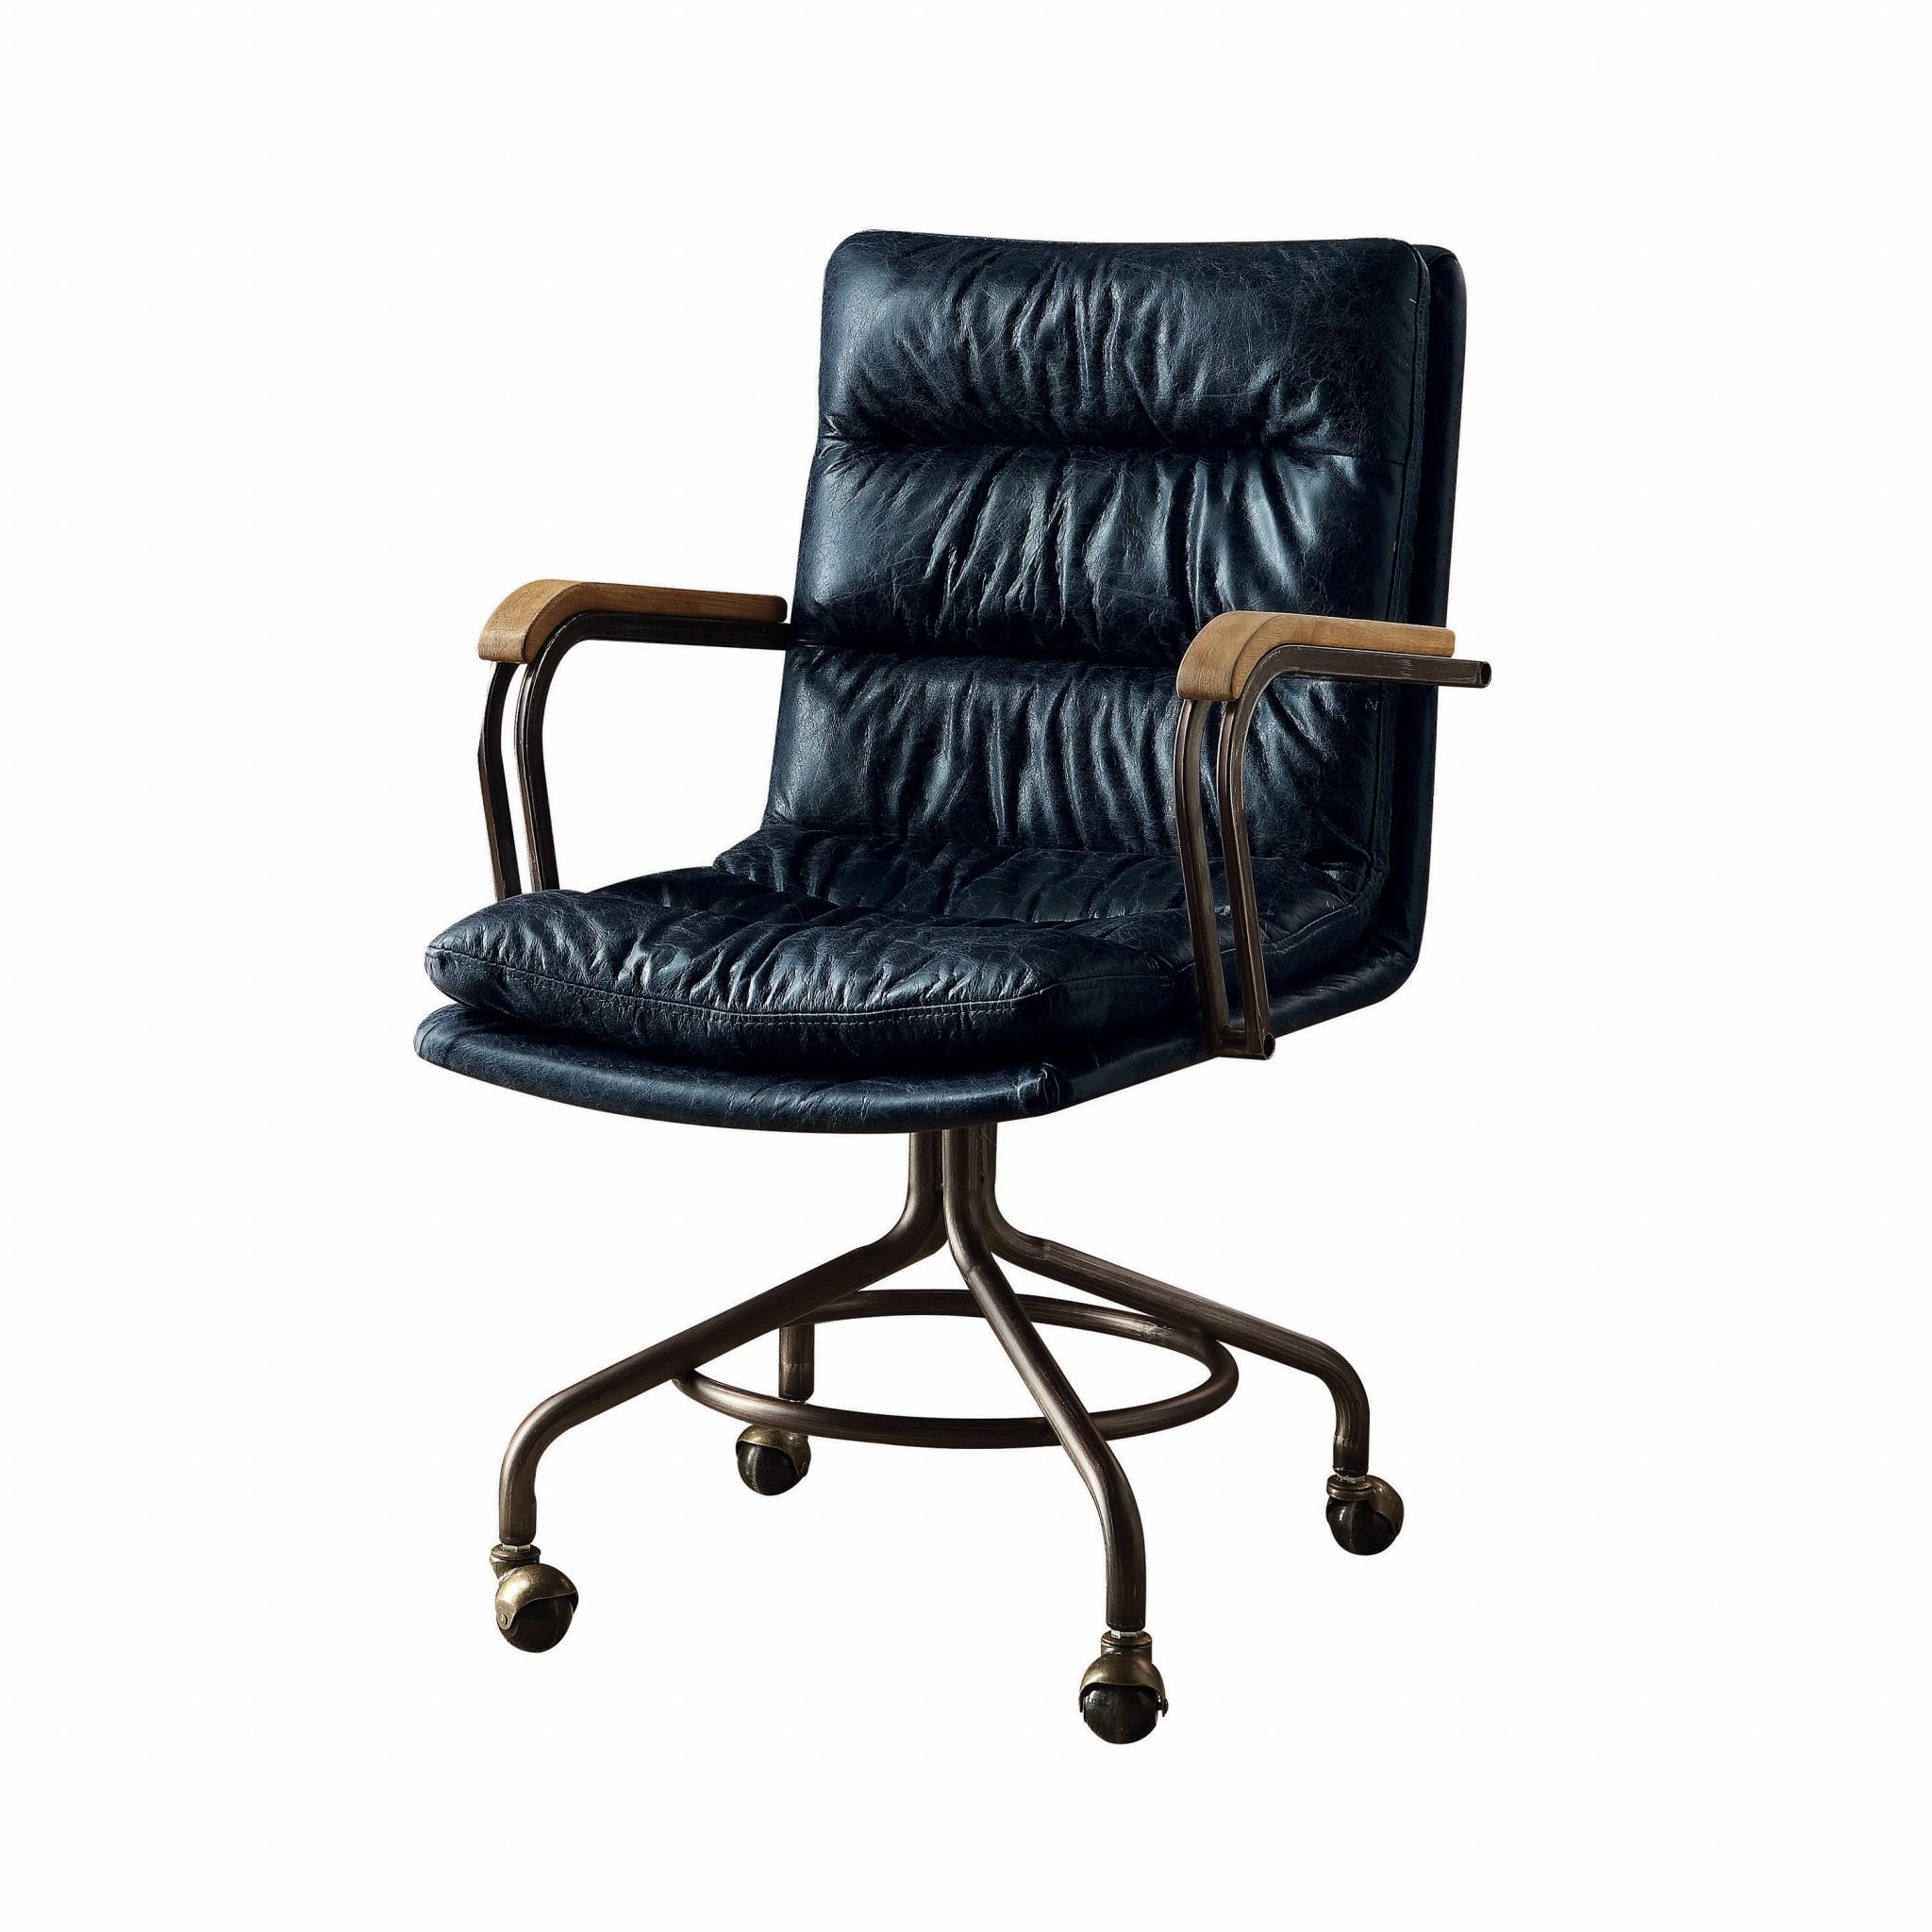 "22"" X 26"" X 36"" Vintage Blue Top Grain Leather Office Chair"